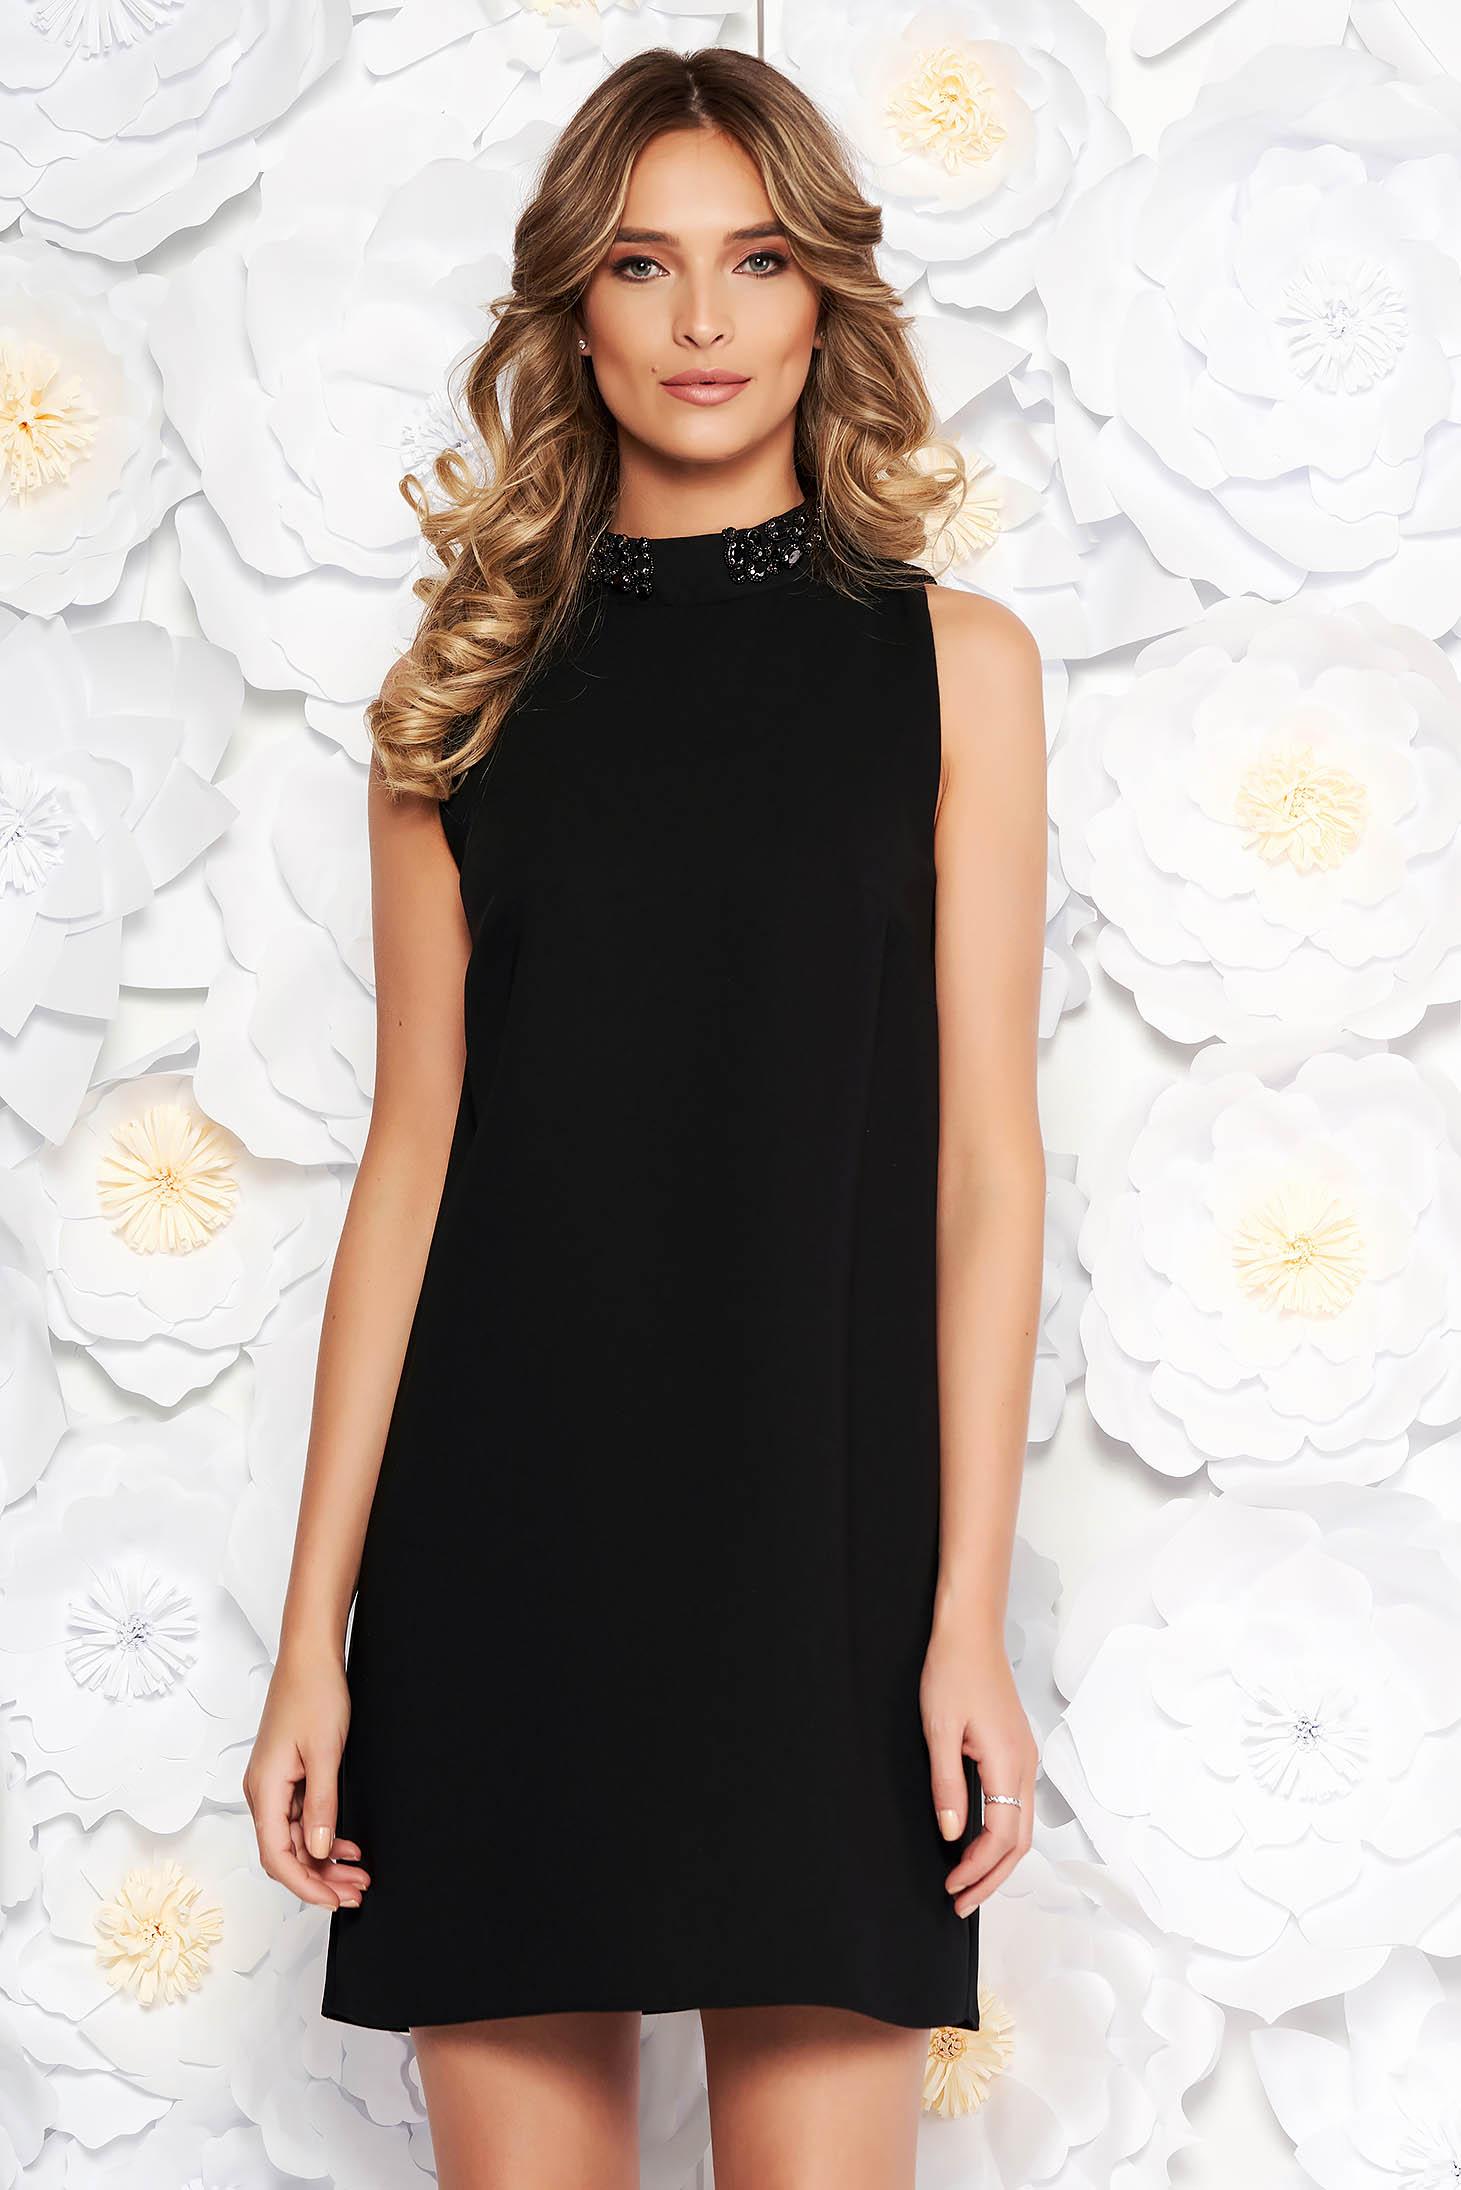 Rochie StarShinerS neagra eleganta cu un croi drept captusita pe interior cu aplicatii cu margele